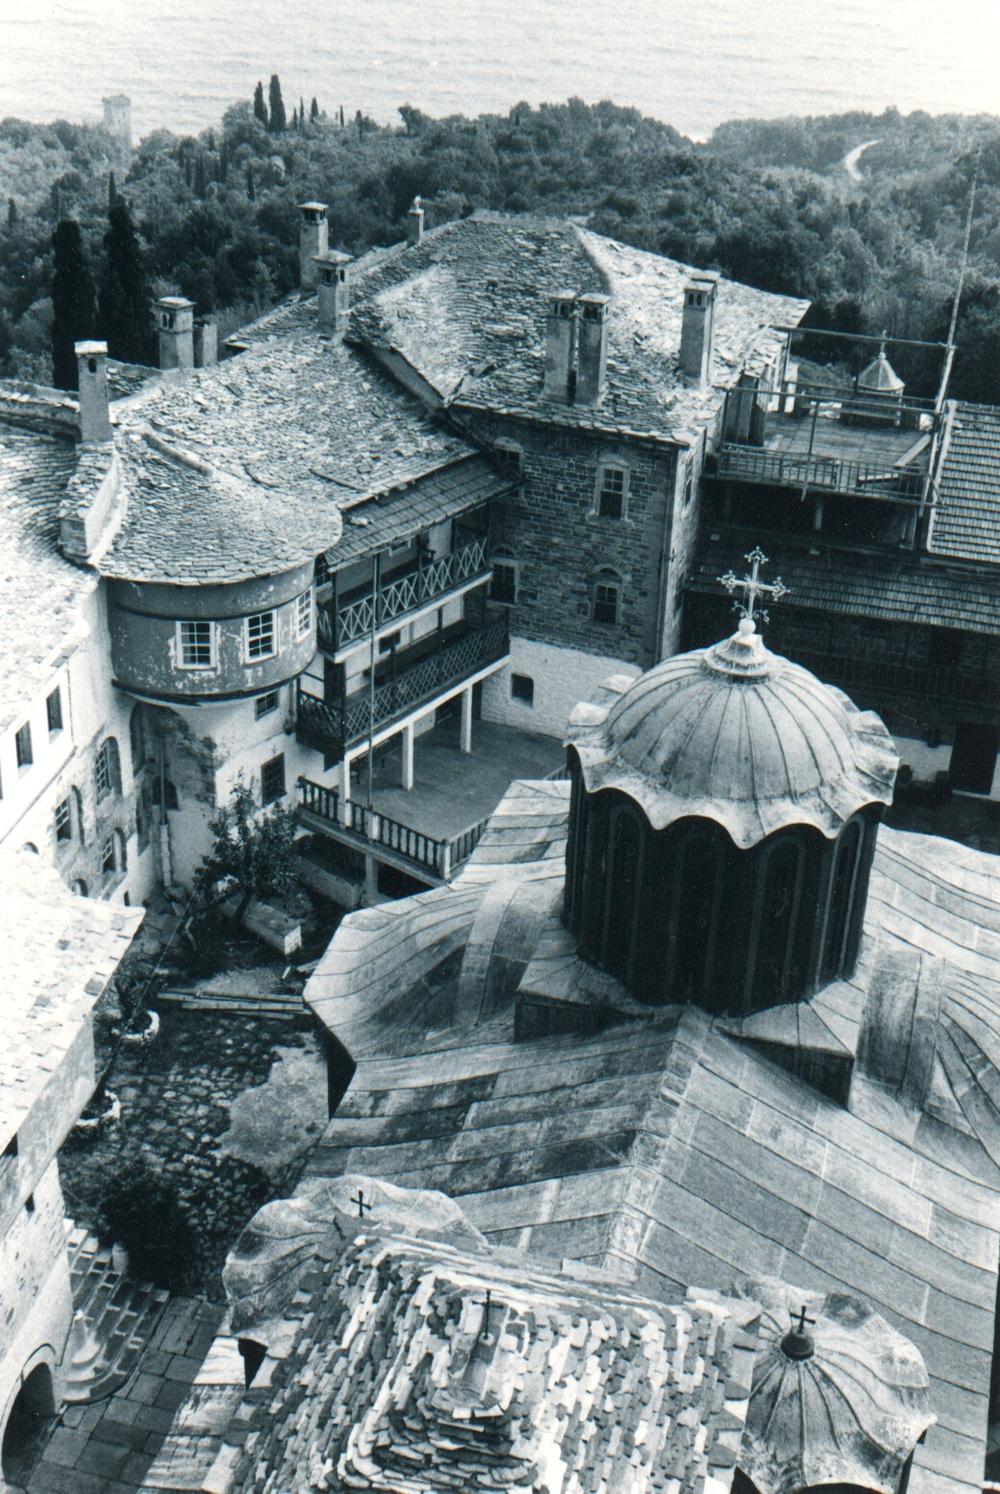 Monastery, Mount Athos, Greece VHS 1988